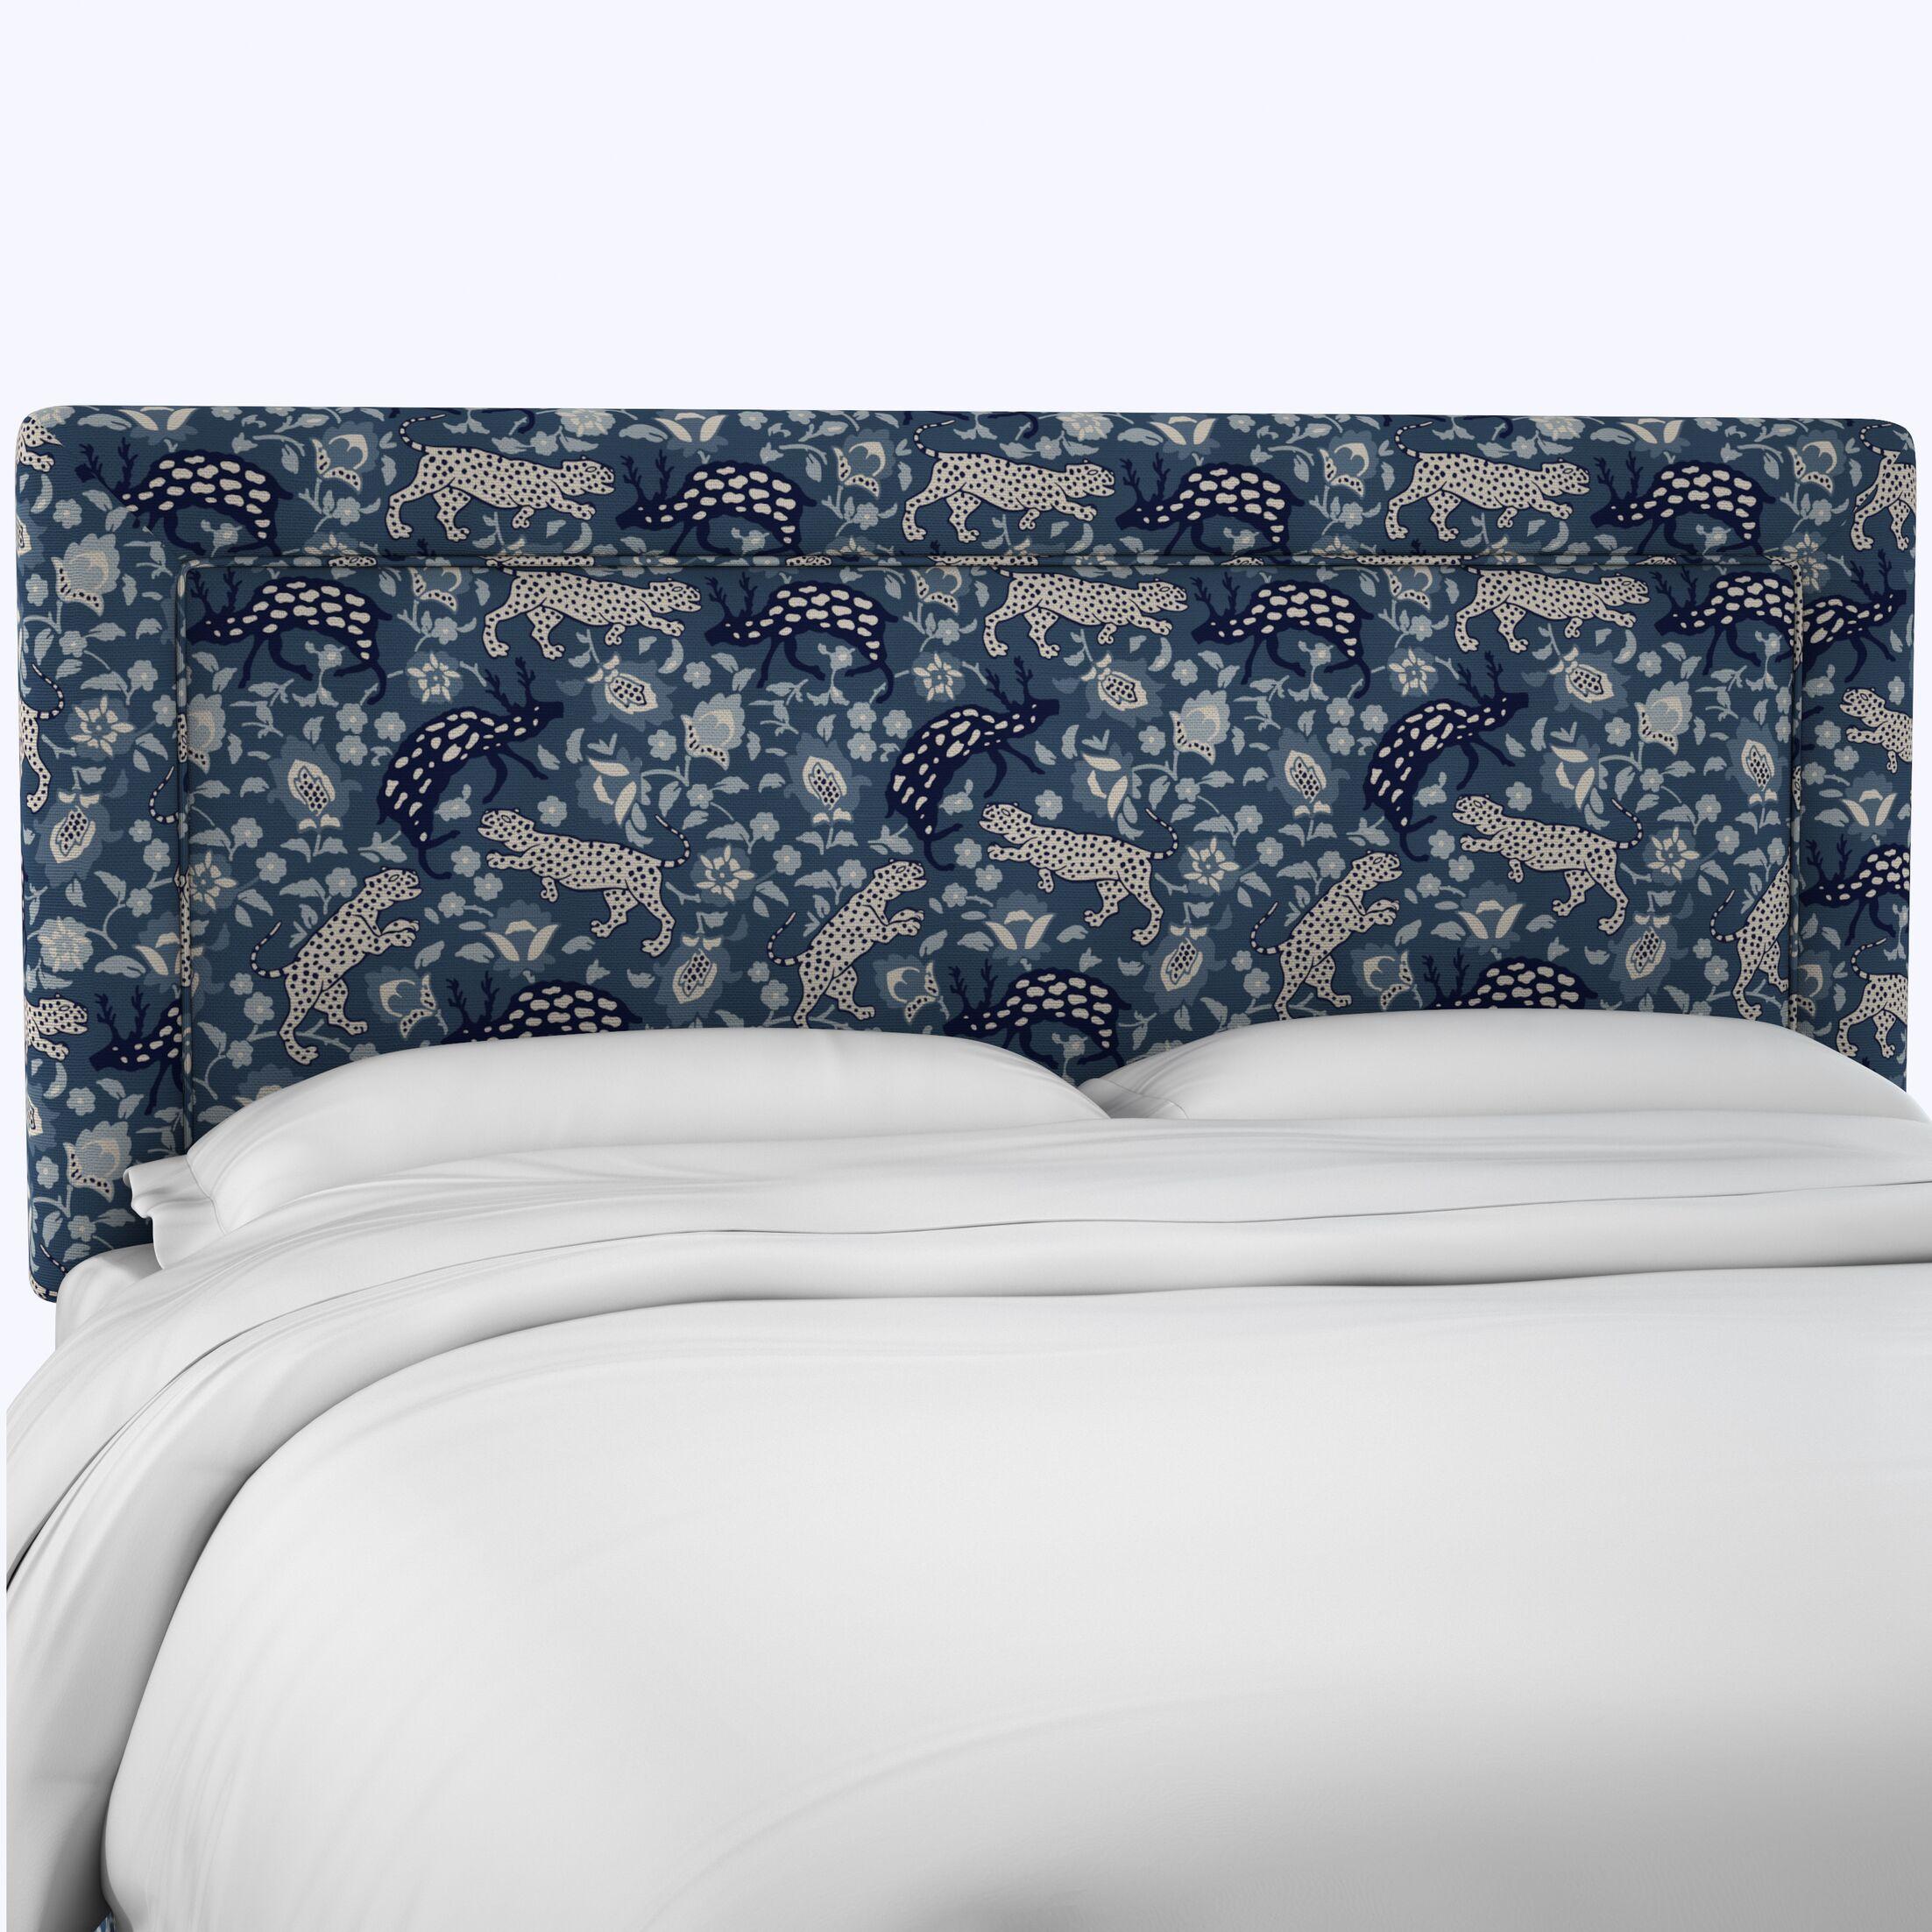 Freeborn Linen Upholstered Panel Headboard Size: King